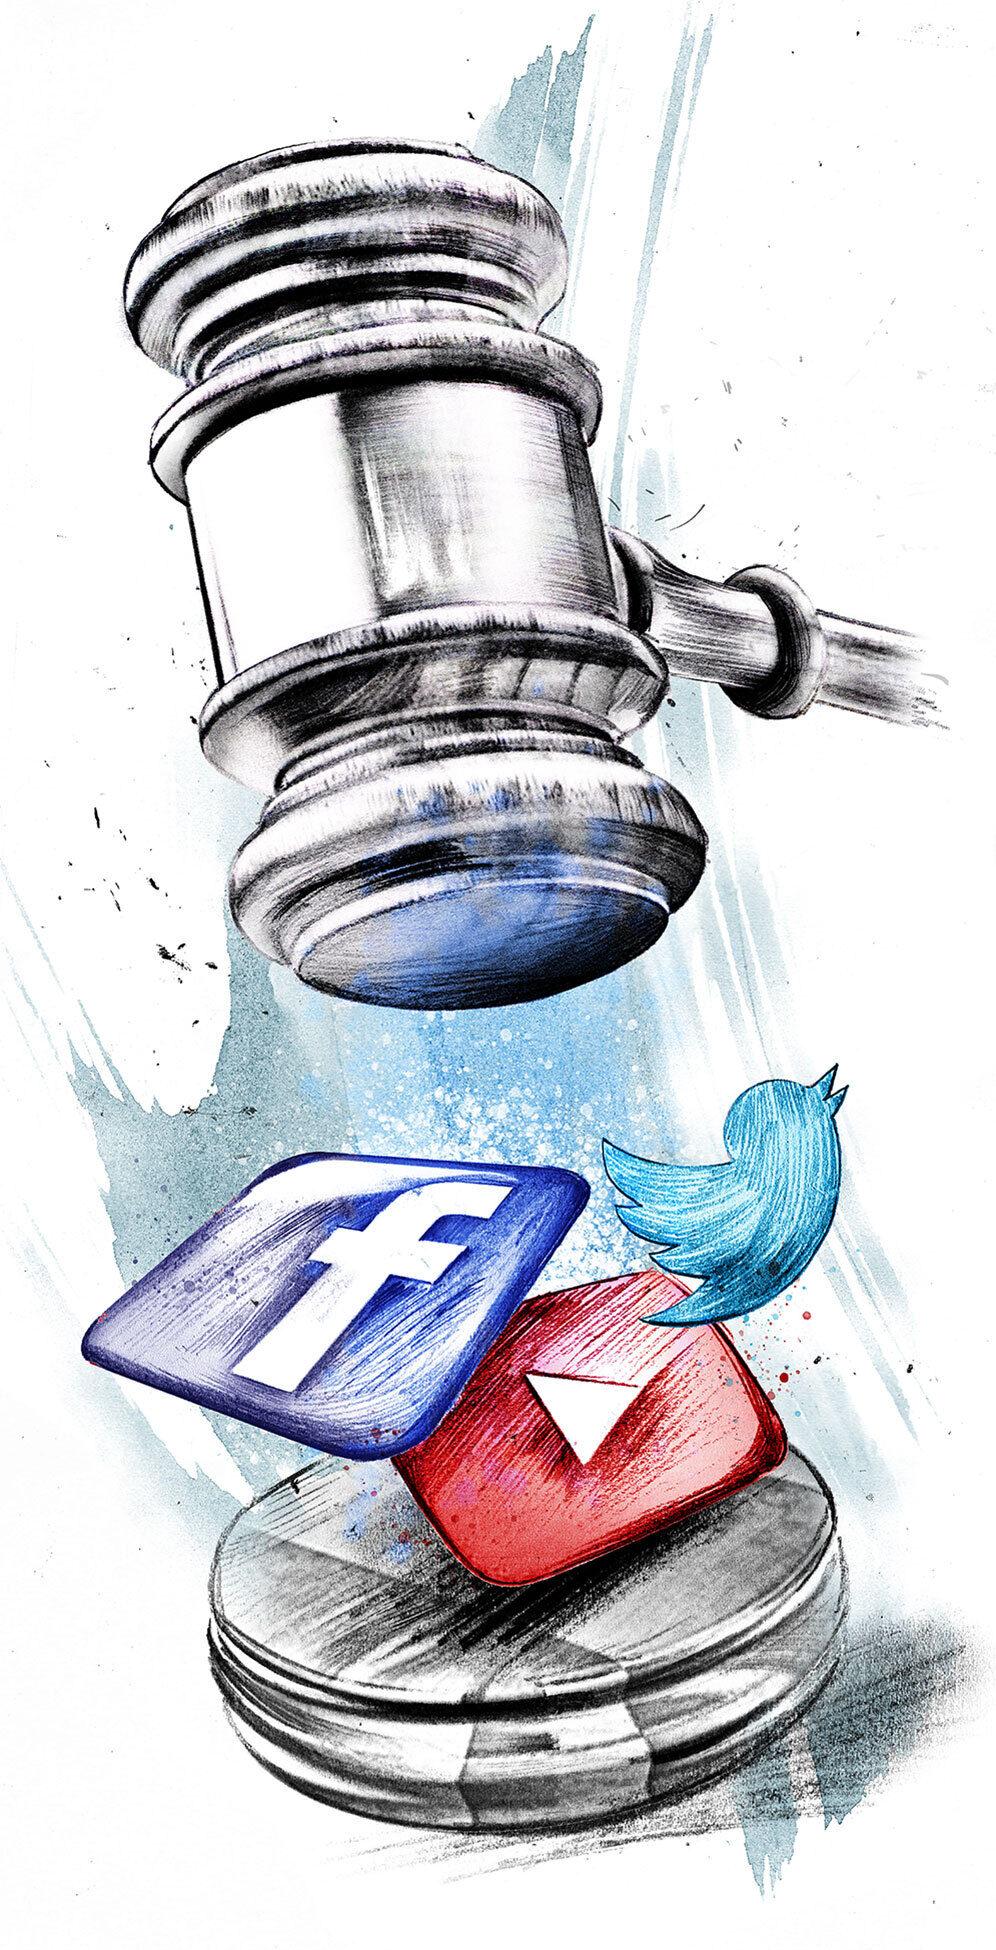 Editorial illustration facebook youtube court - Kornel Illustration | Kornel Stadler portfolio